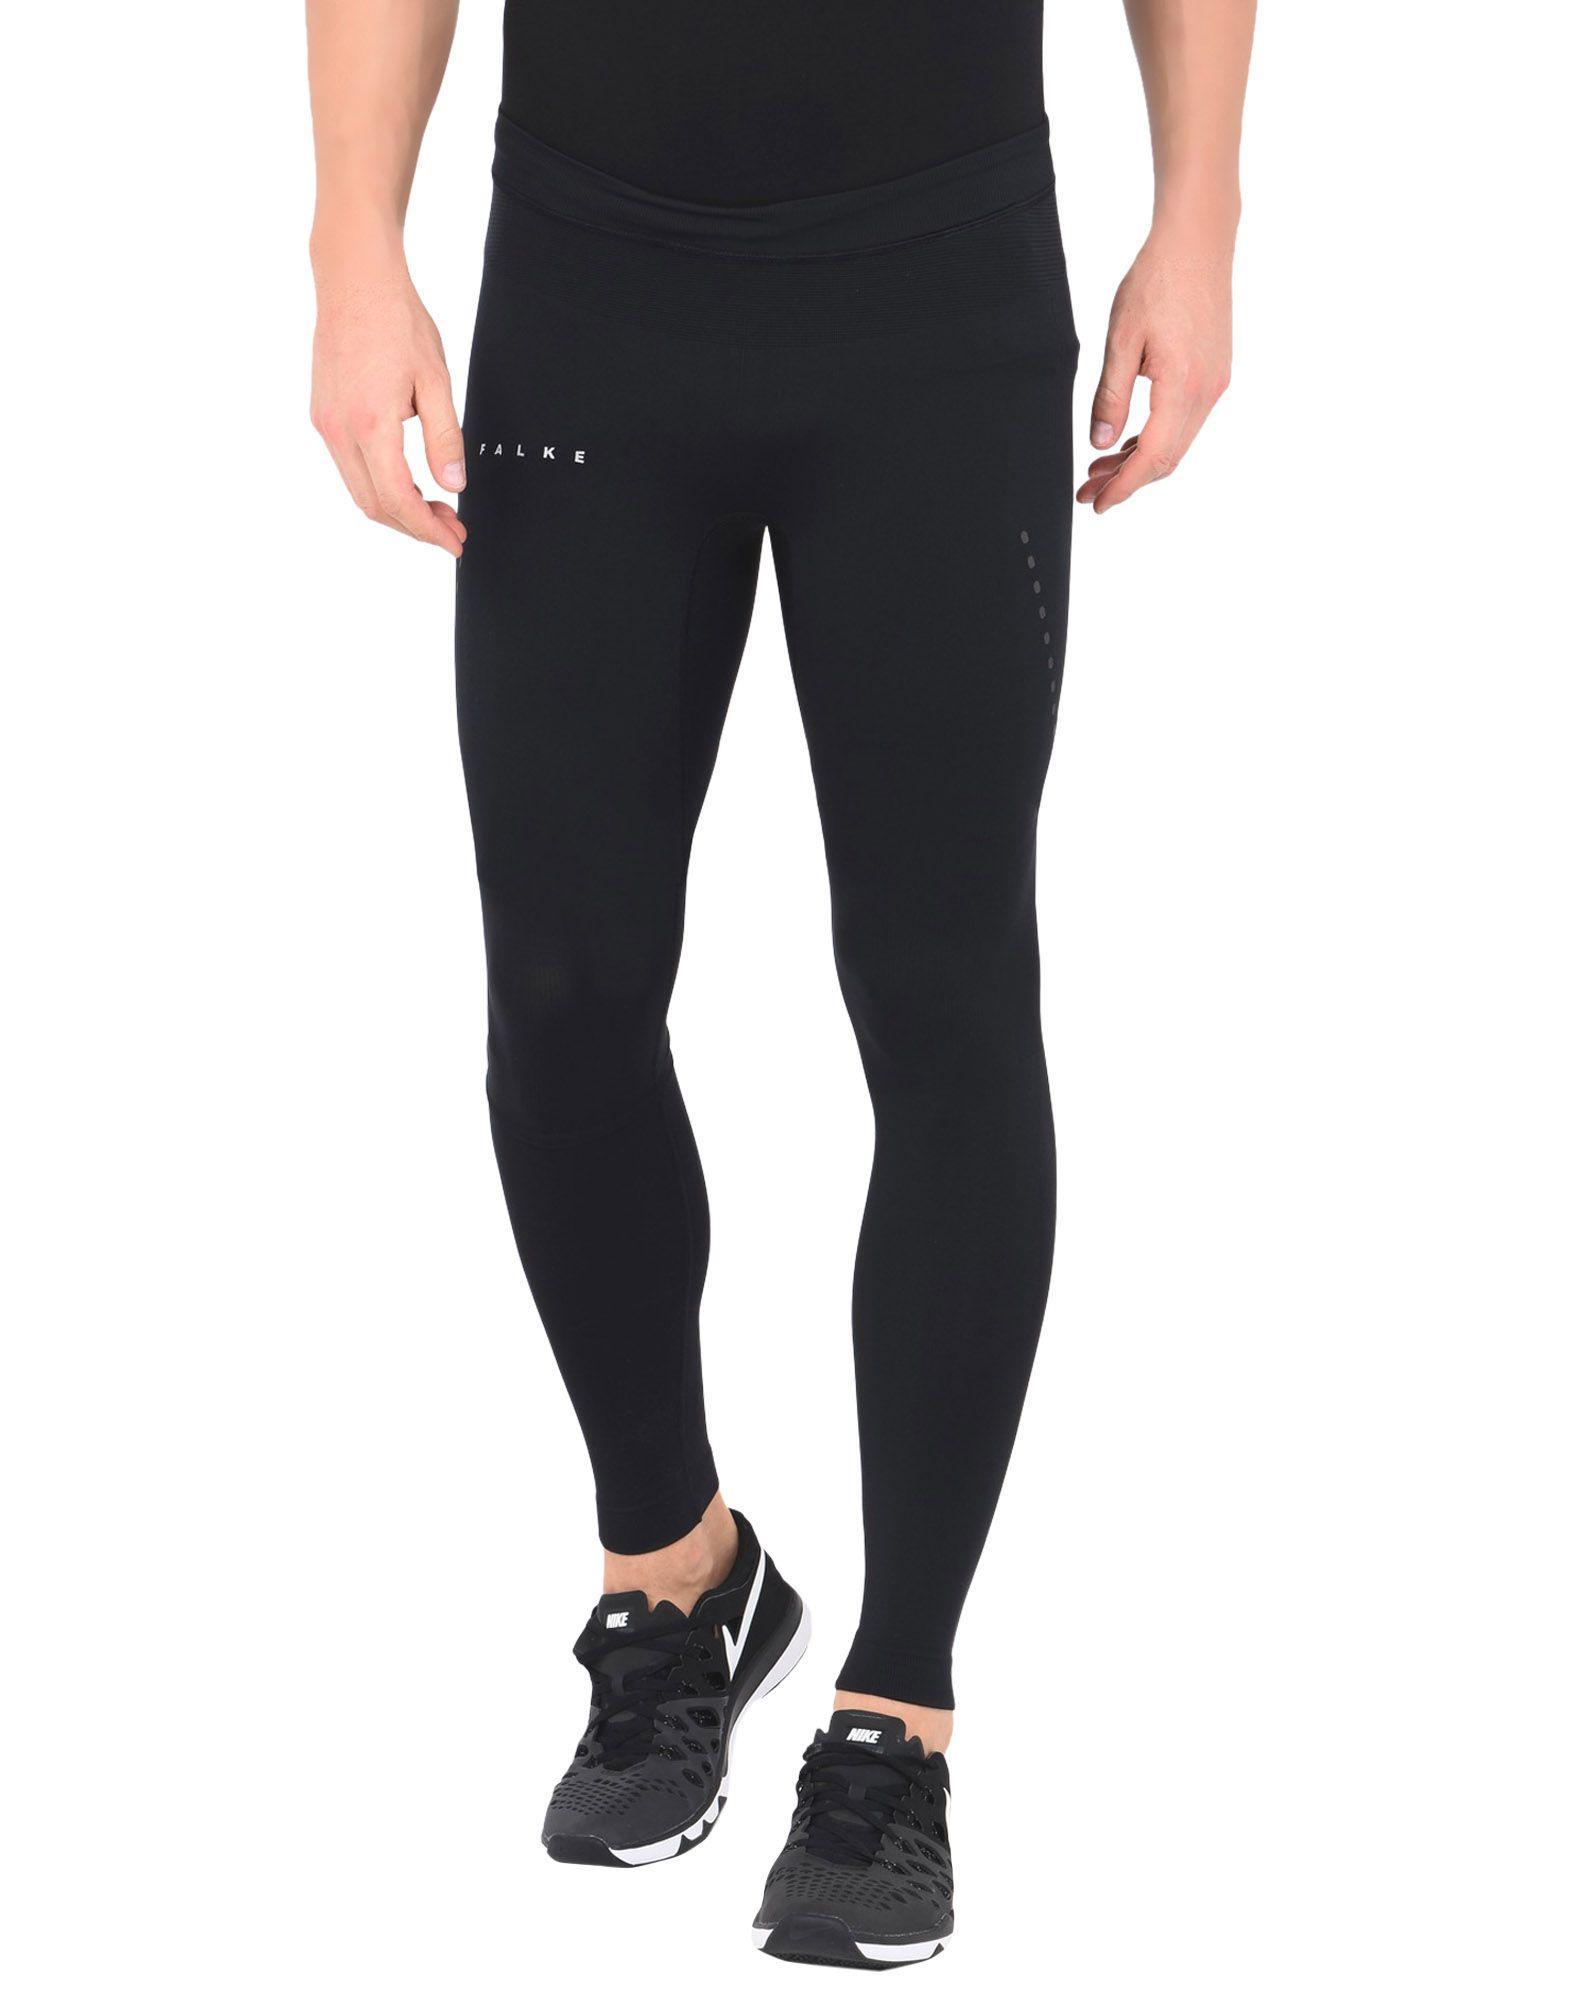 Falke Athletic Pant In Black